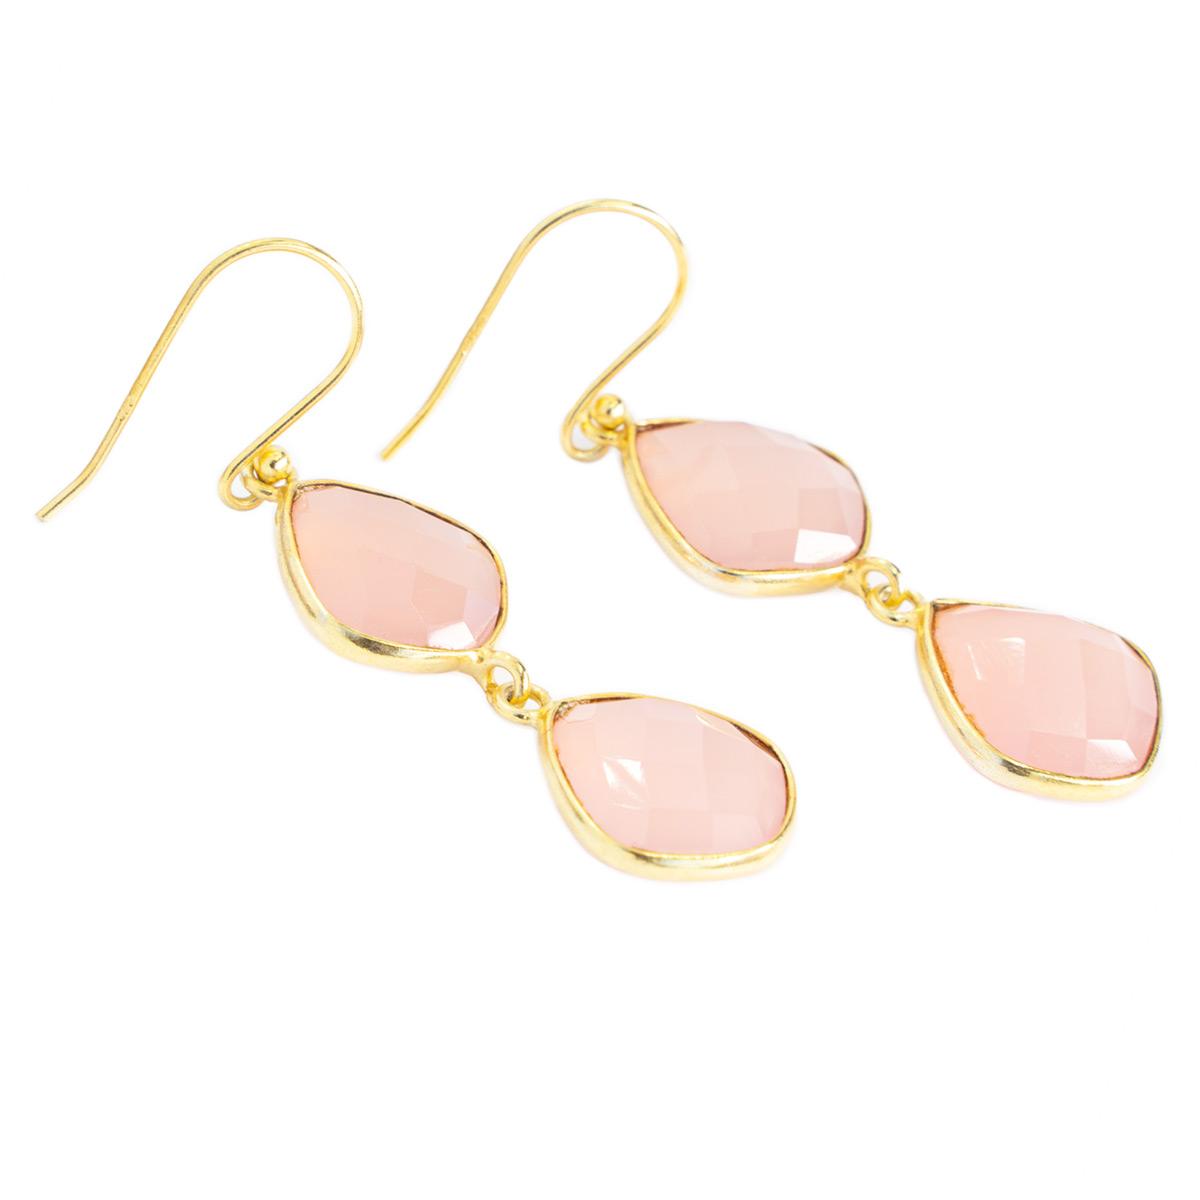 Sri Avinash Infused™ Rose Quartz Earrings - Lightness & Joy Infusion